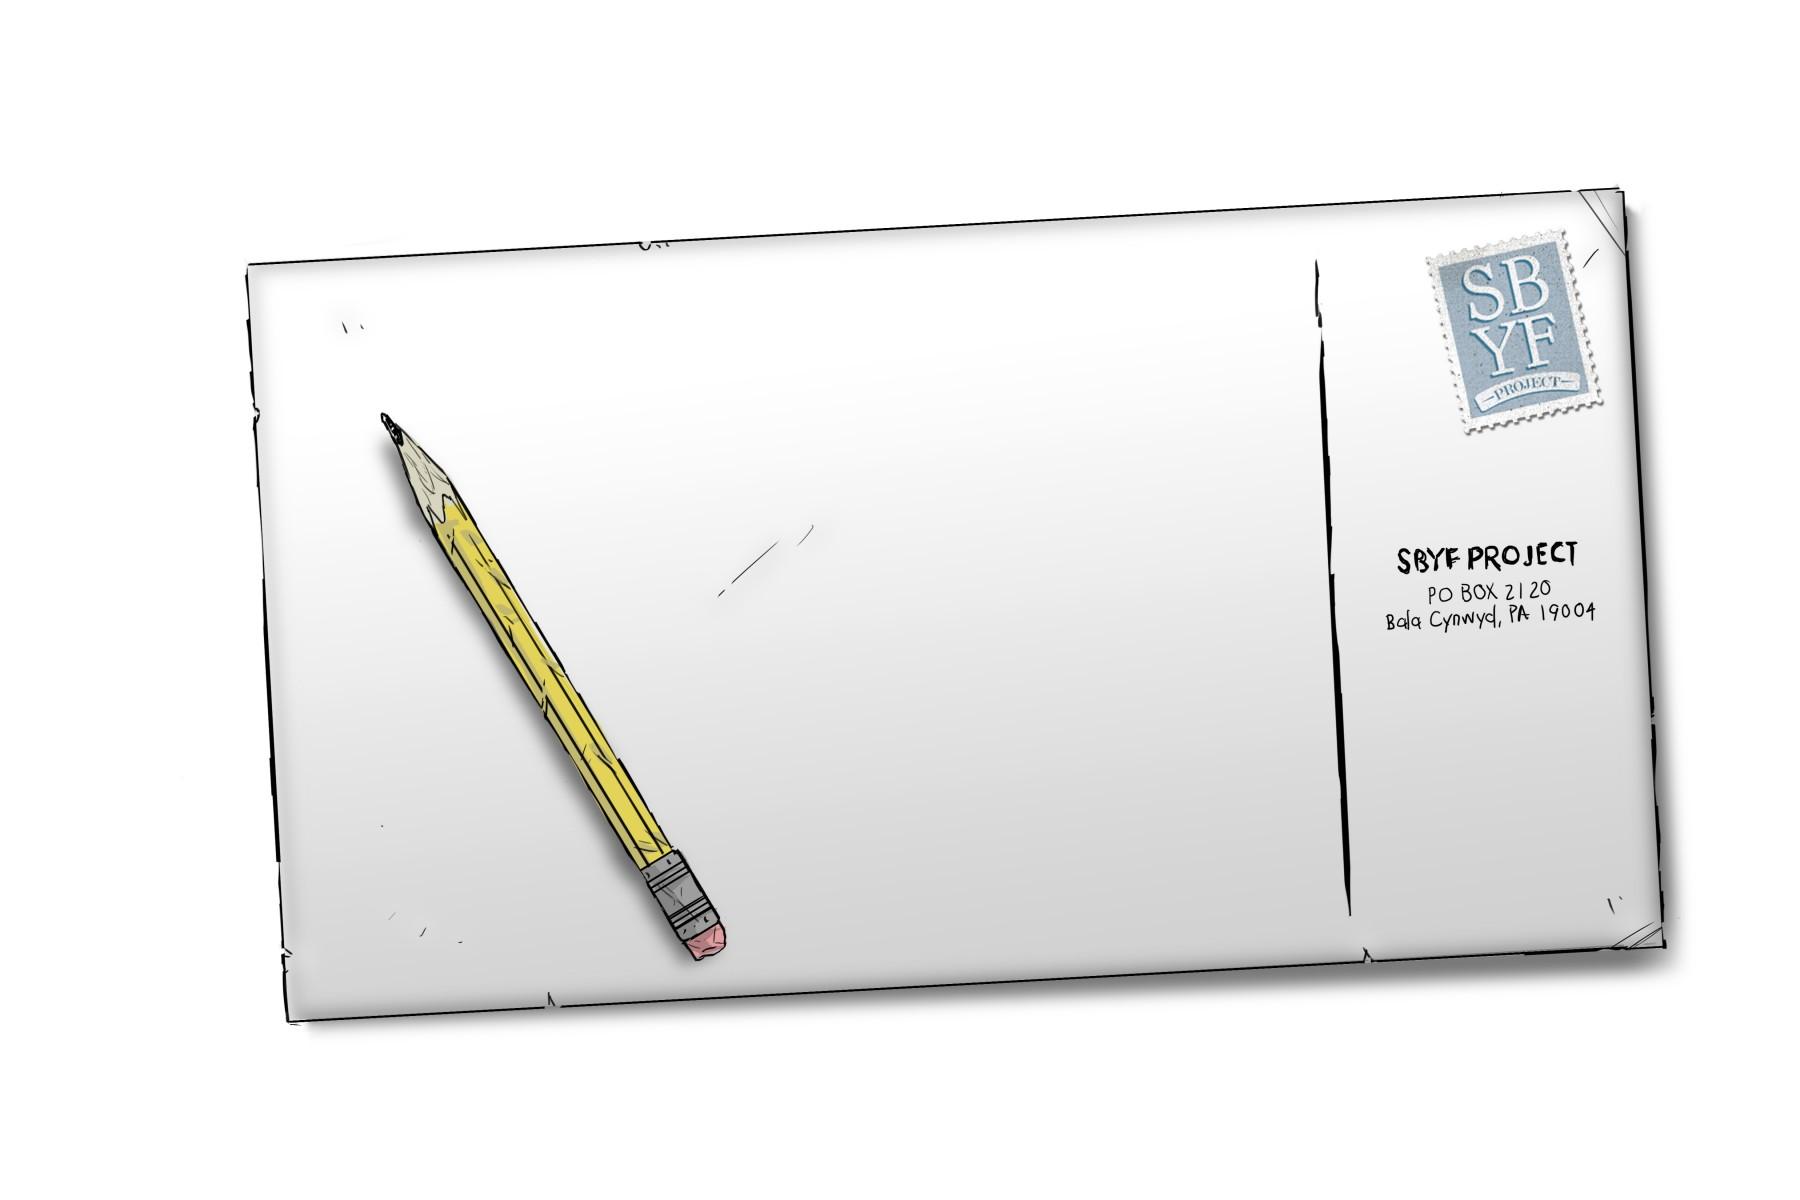 PostcardandPencil